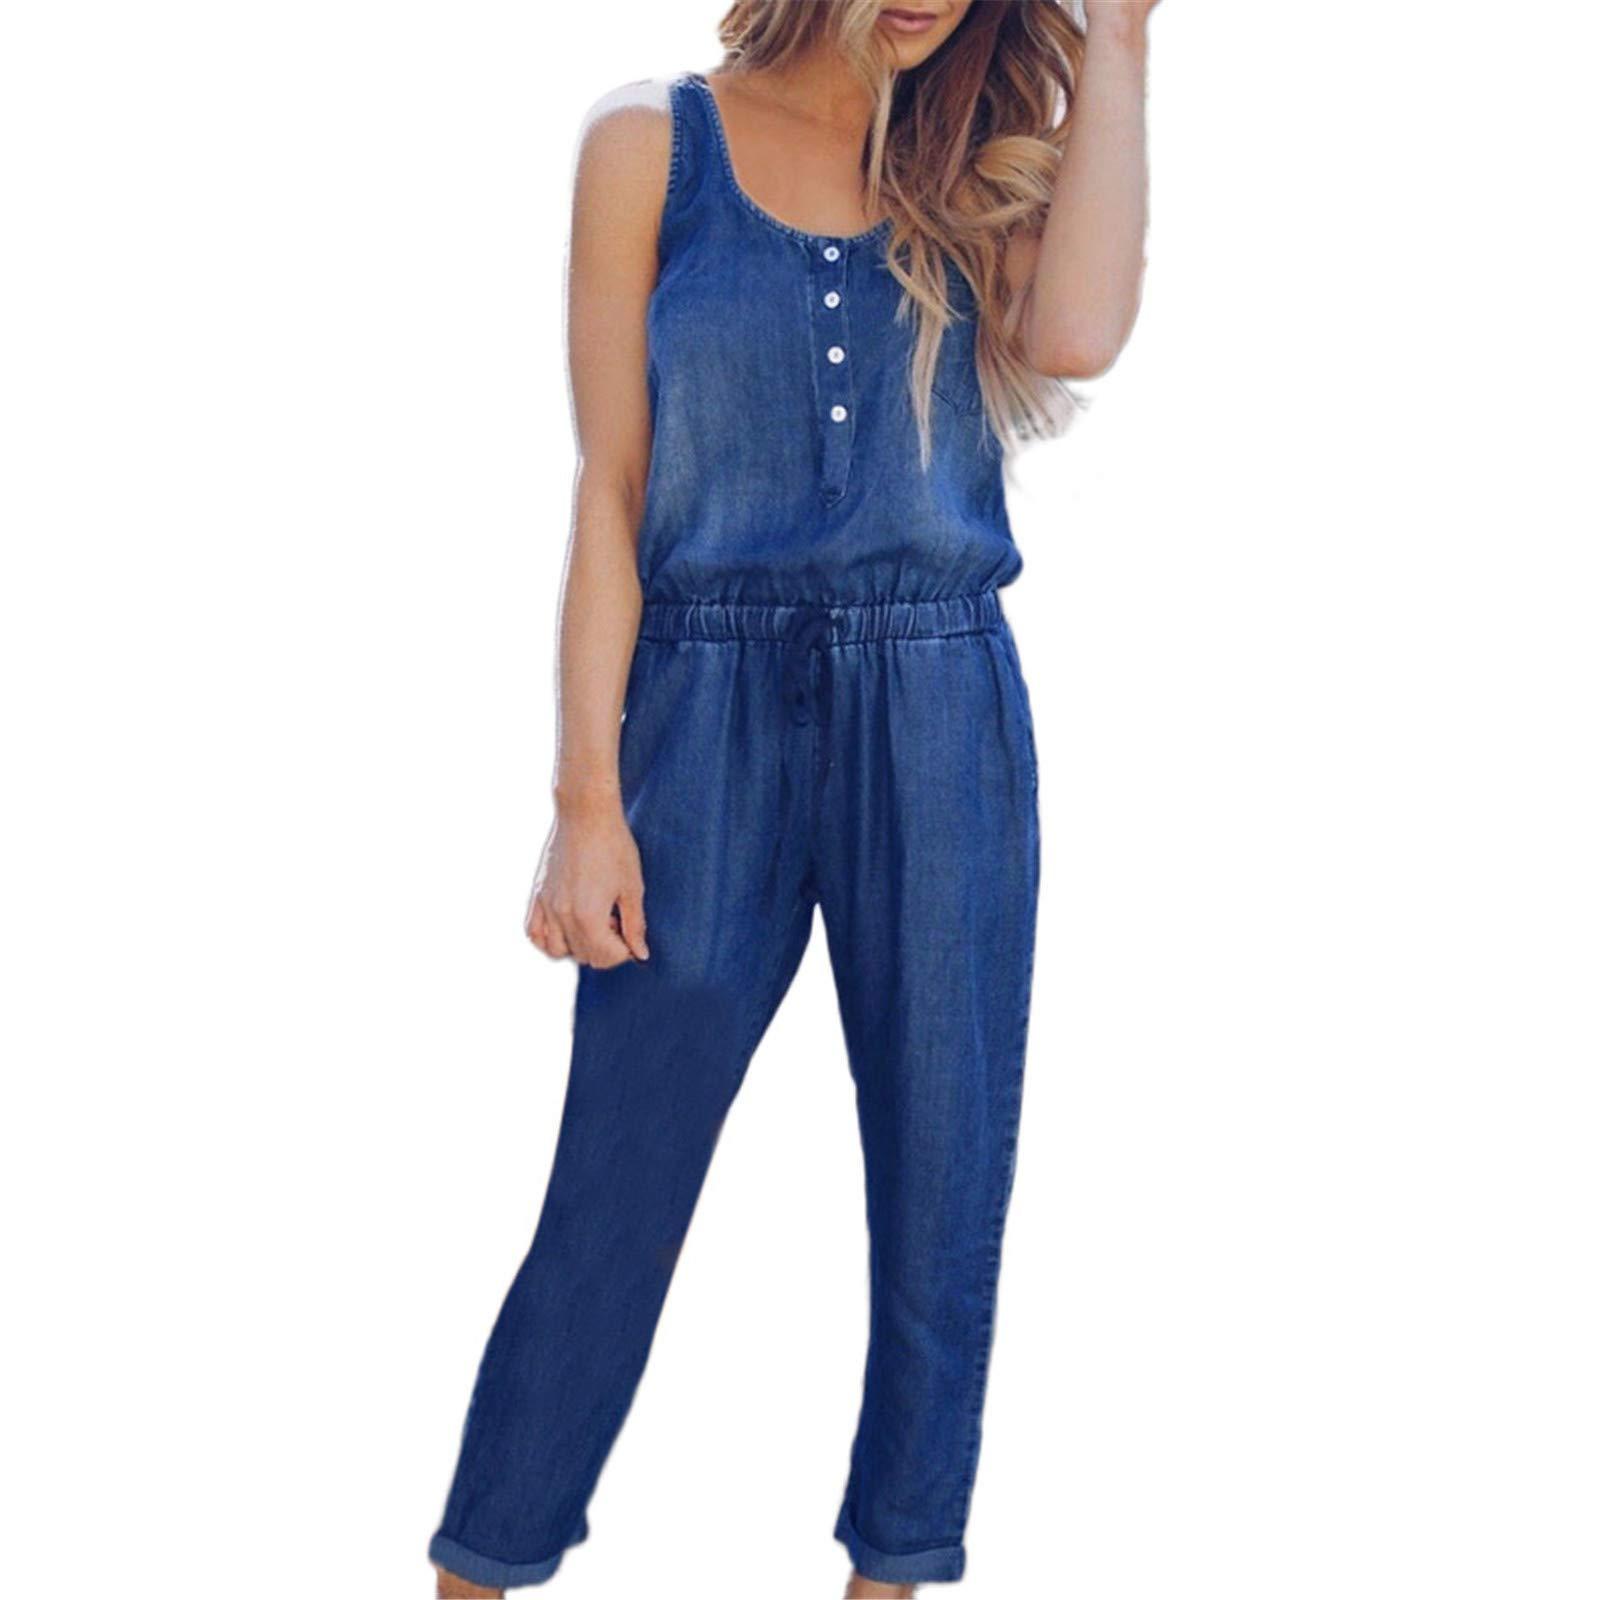 Thenxin Womens Jeans Playsuit O-Neck Sleeveless Elastic Waist Denim Long Casual Jumpsuits(Deep Blue,XL)